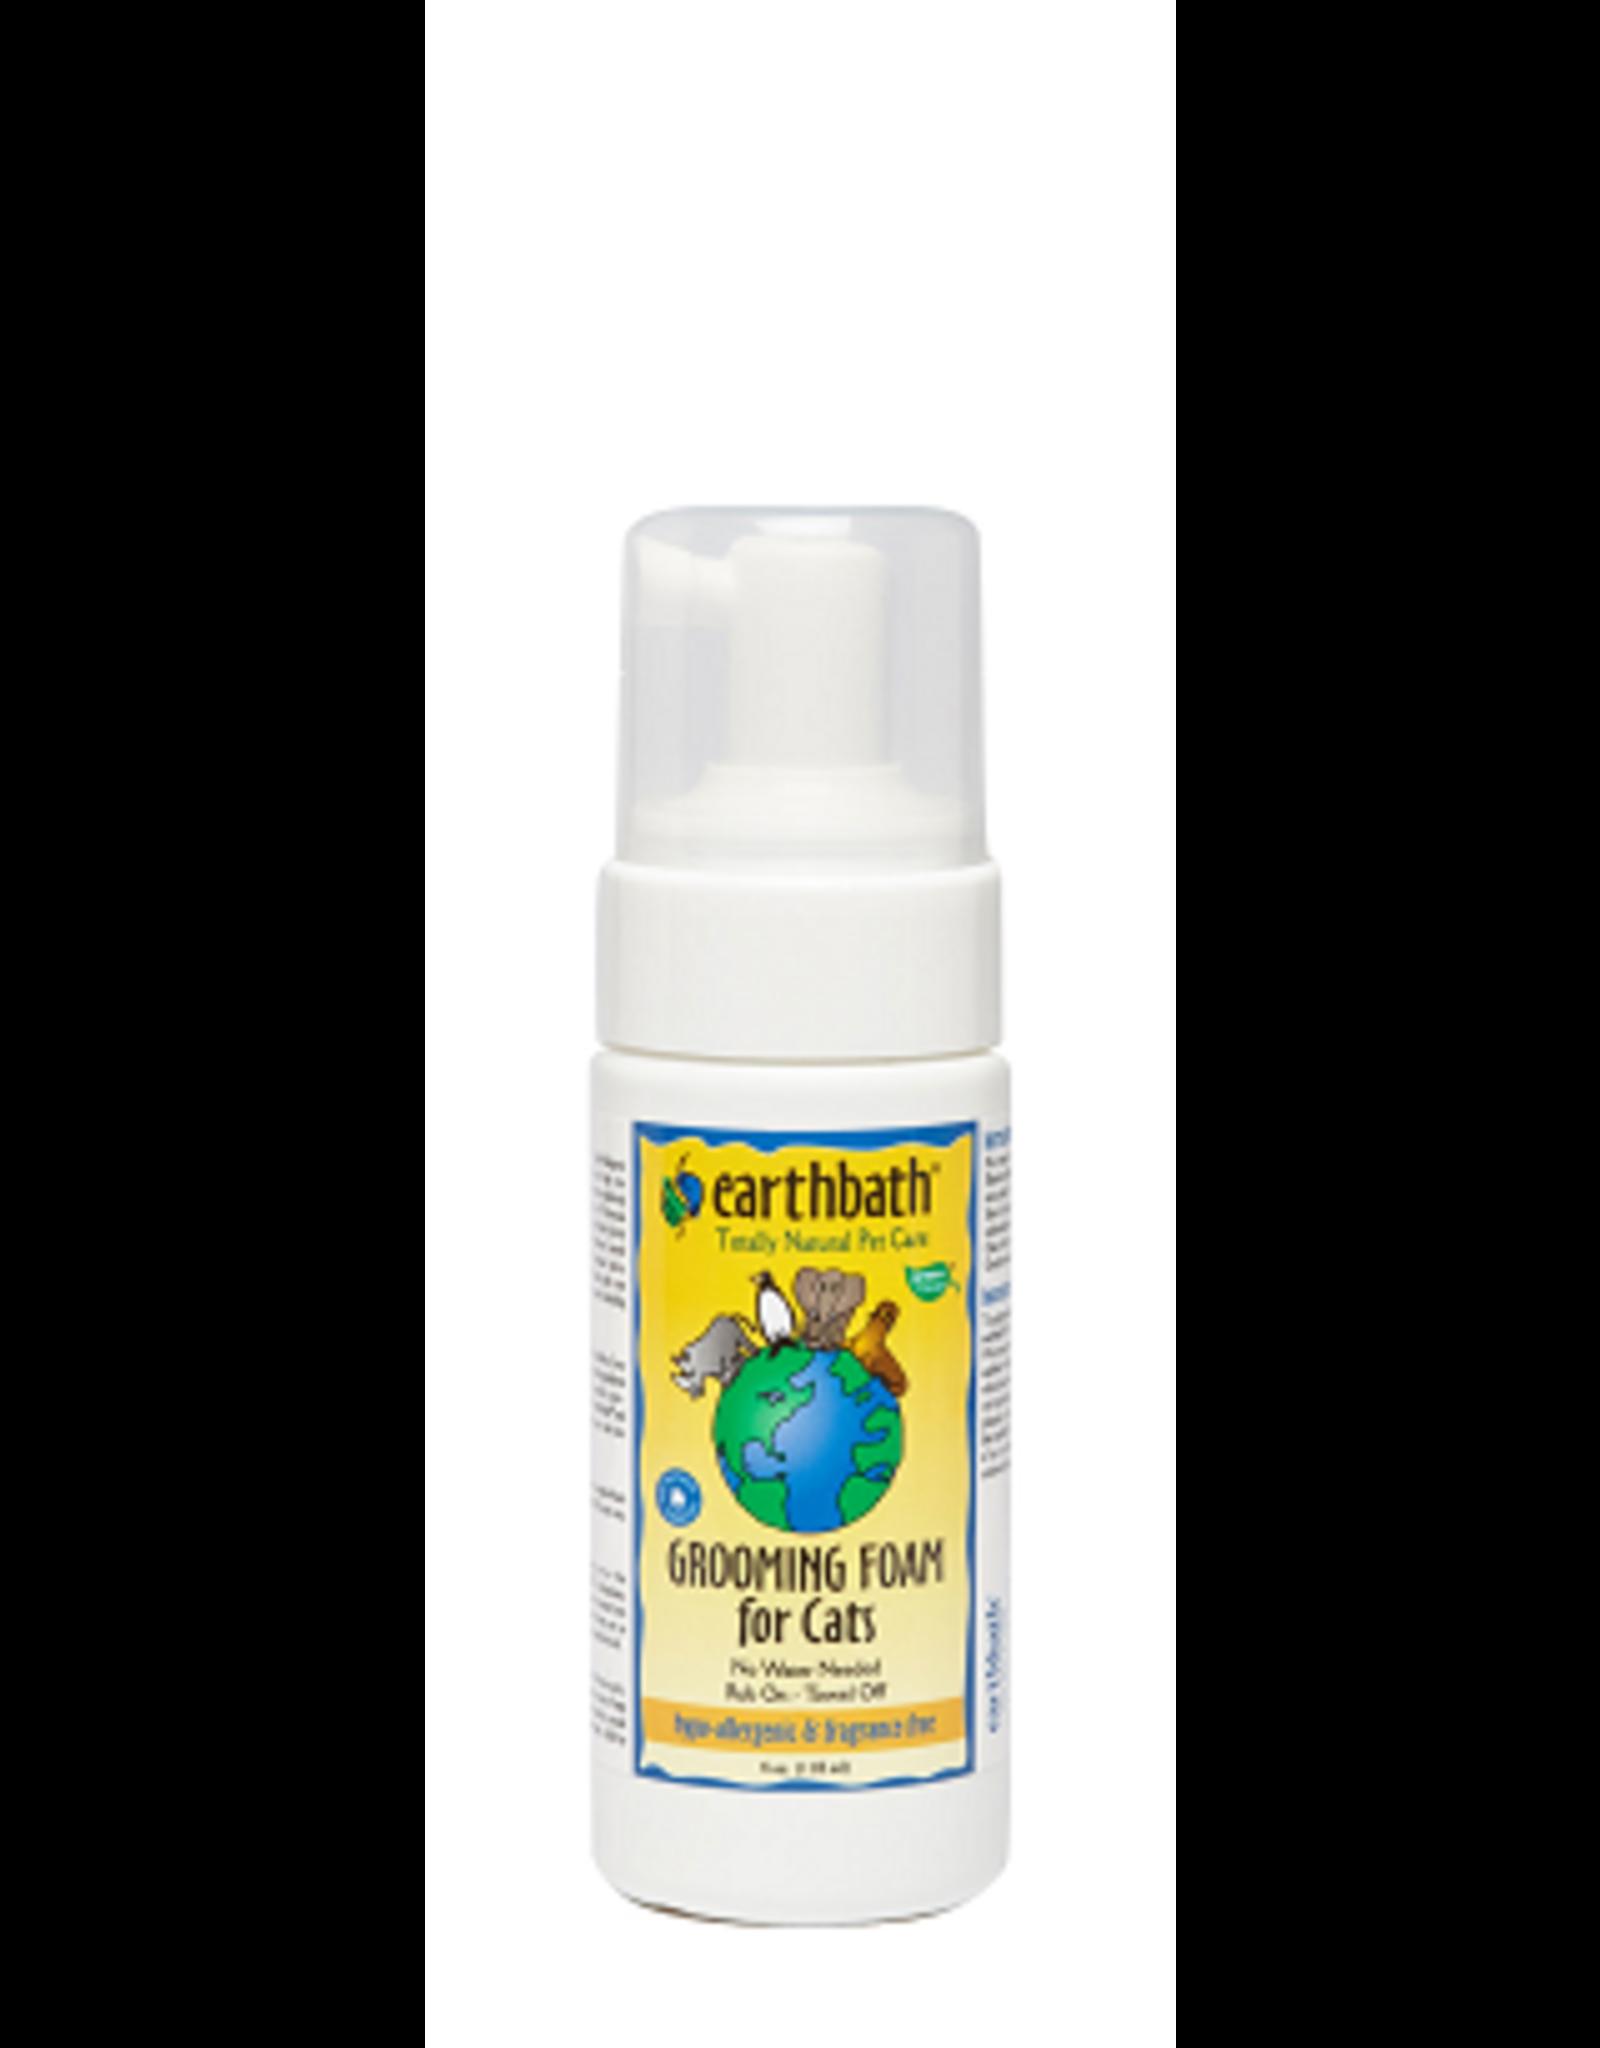 Earthbath EARTHBATH Waterless Cat Hypo-Allergenic